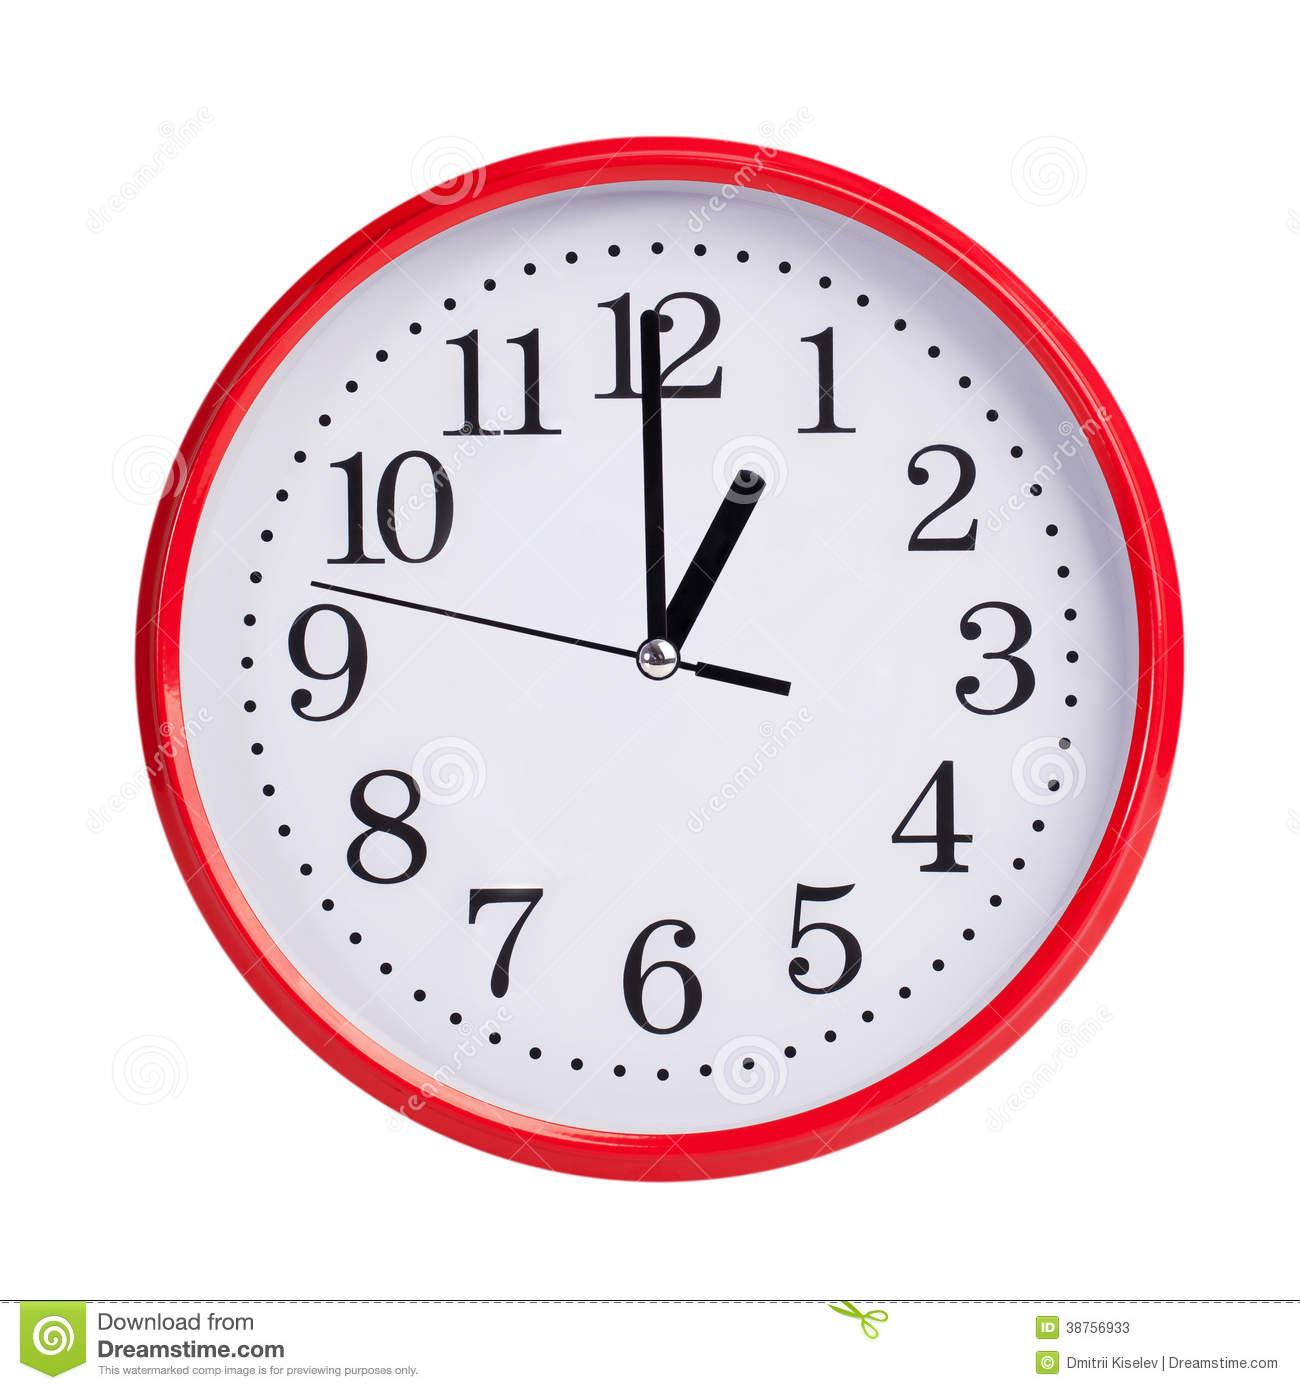 One o'clock clipart.